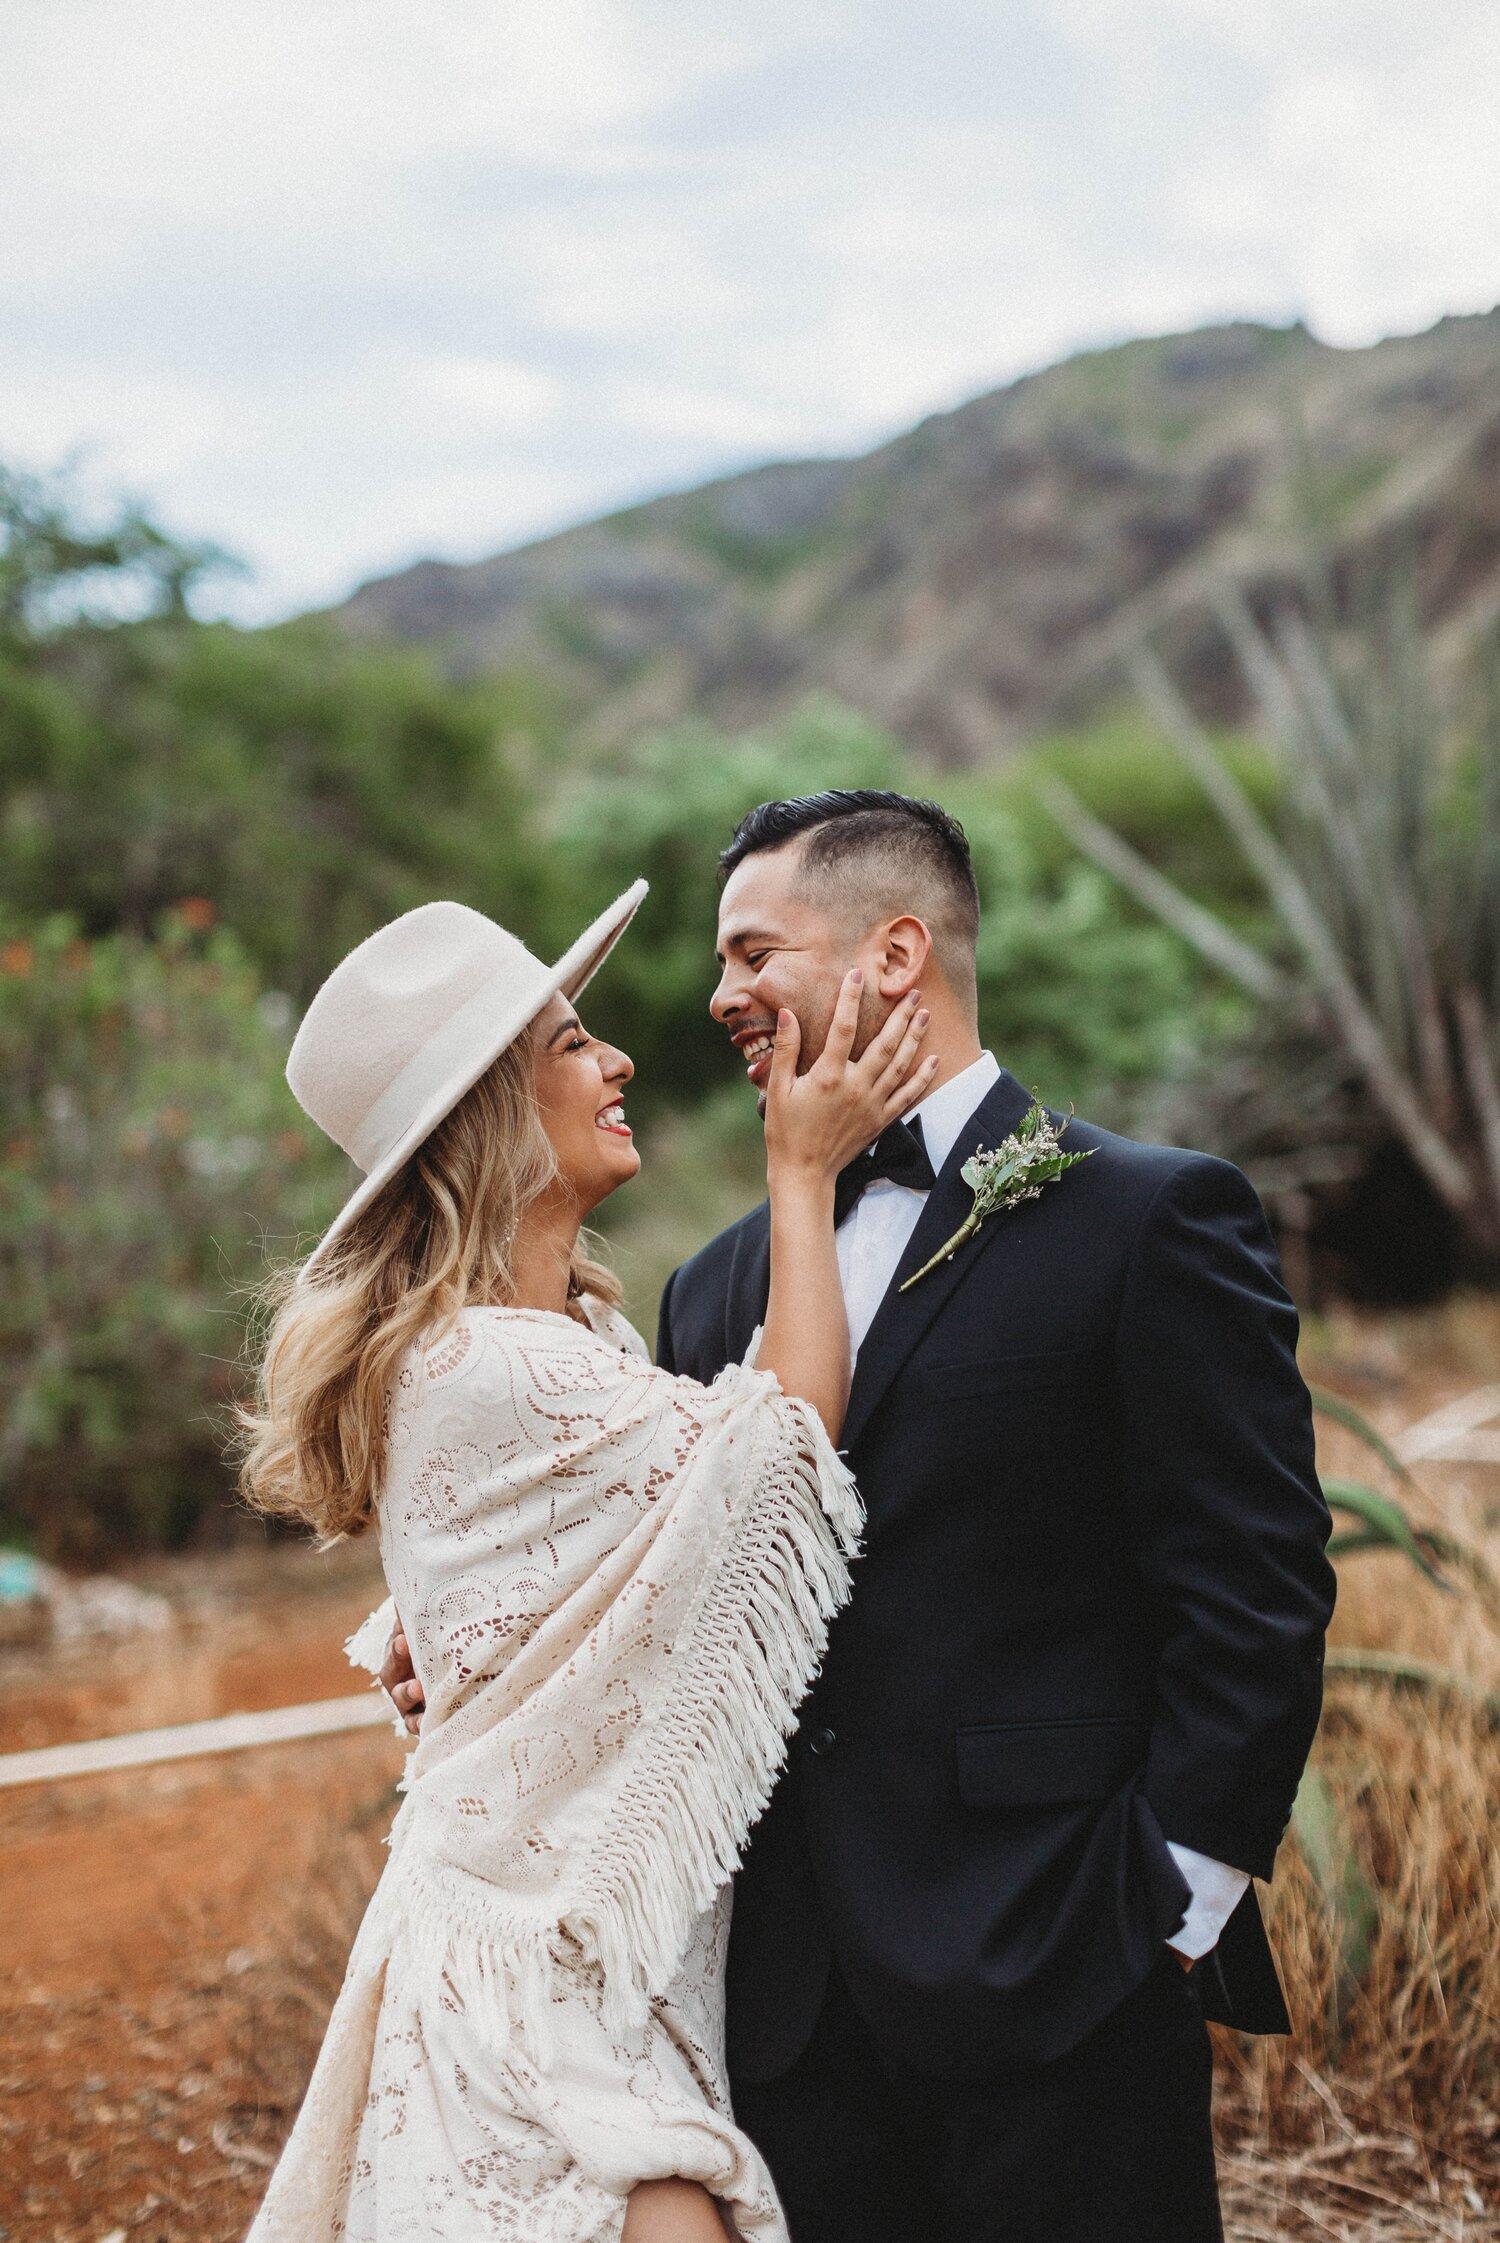 Boho Cactus Elopement - Honolulu, Koko Crater Botanical Garden - Oahu Hawaii Wedding Photographer 15.jpg